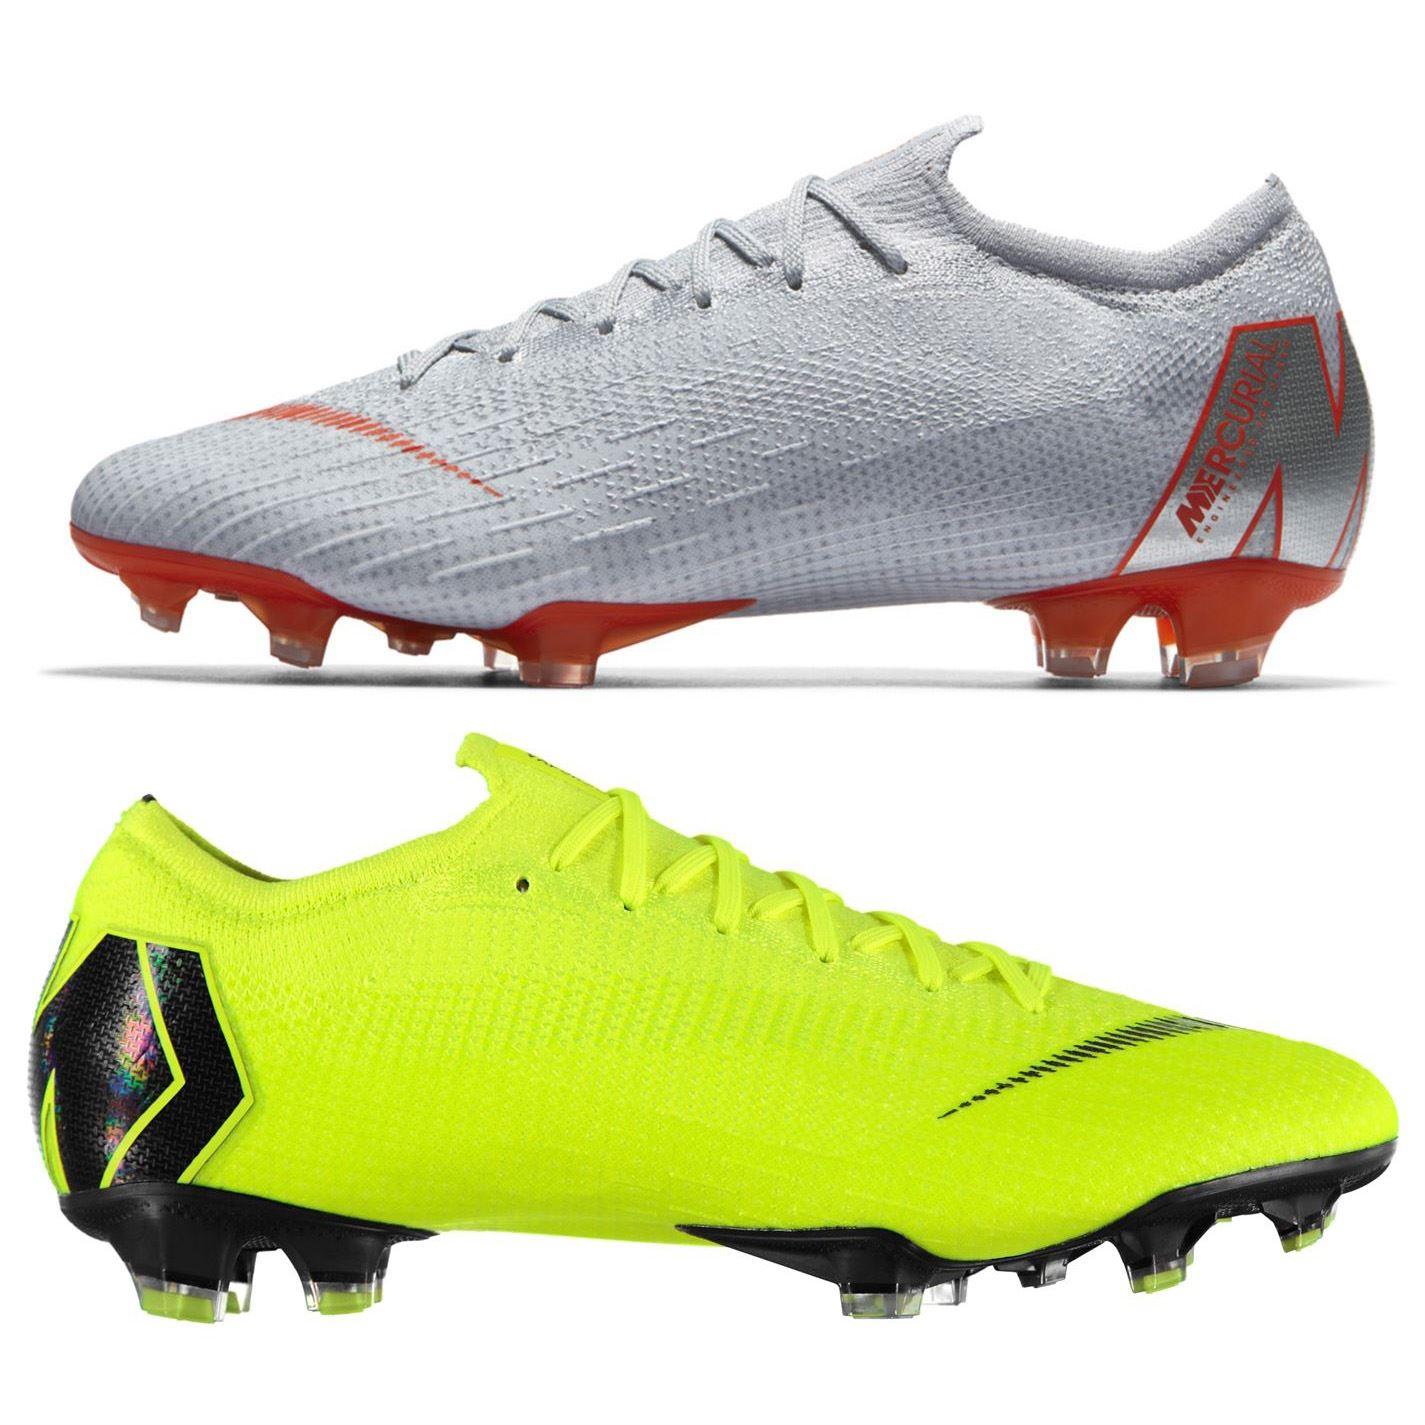 29142e086215 Nike Mercurial Vapor Elite FG Firm Ground Football Boots Mens Soccer Shoe  Cleats